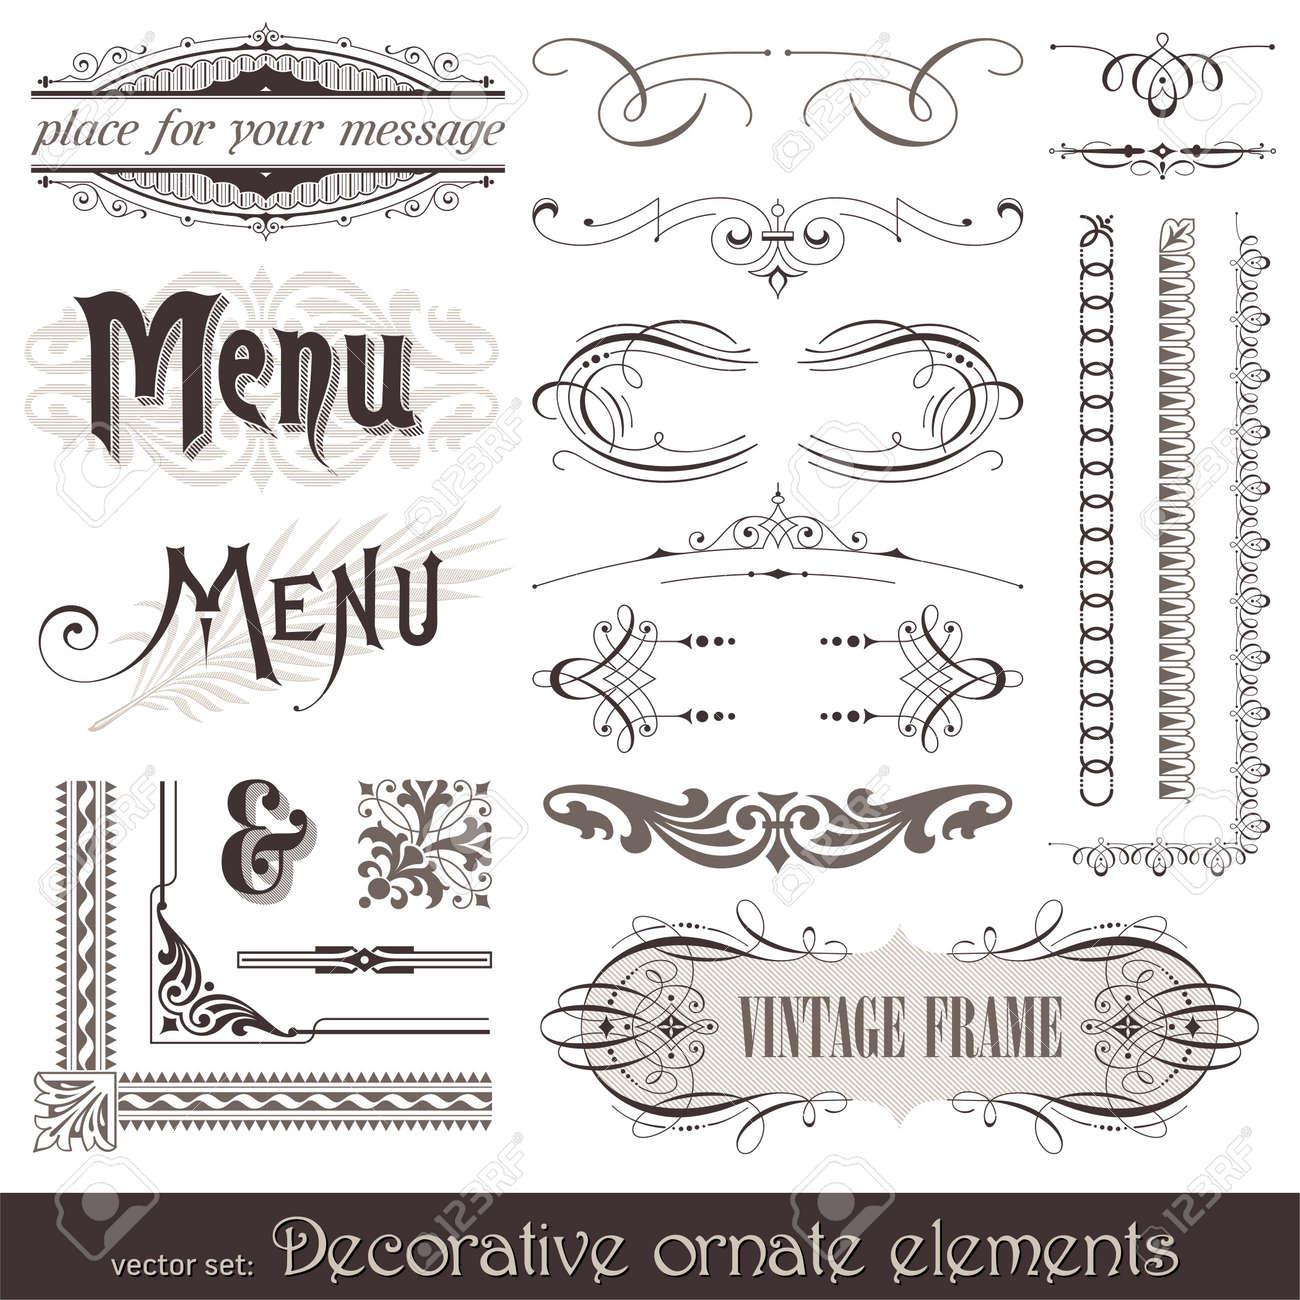 Vector decorative ornate design elements & calligraphic page decorations Stock Vector - 9857348